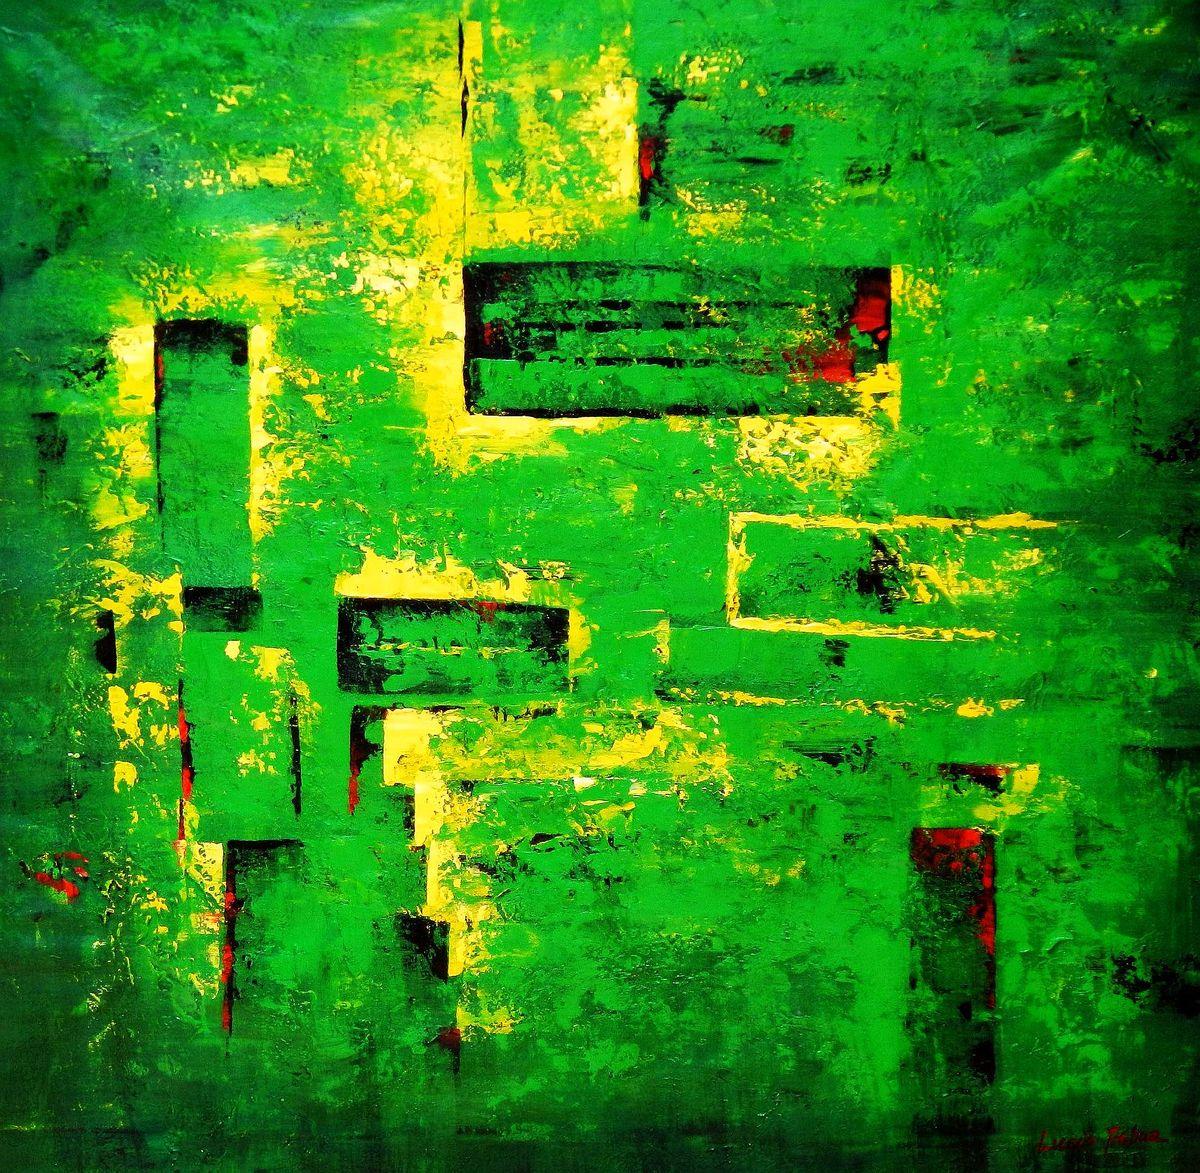 Abstrakt - Berlin Tiergarten m93817 120x120cm abstraktes Ölbild handgemalt